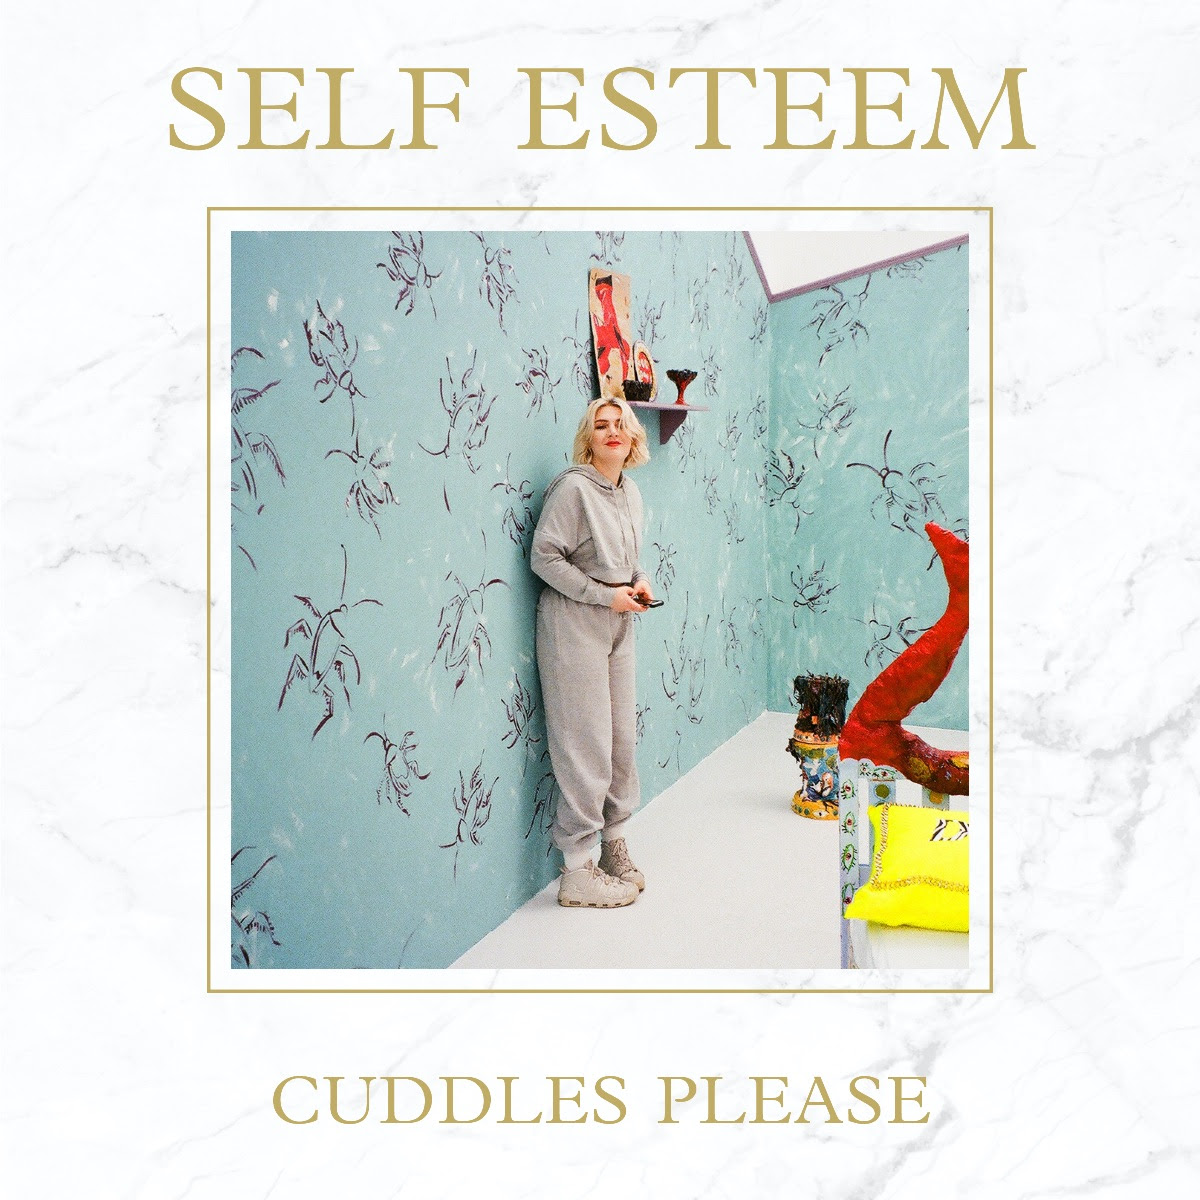 Self Esteem - Cuddles Please EP